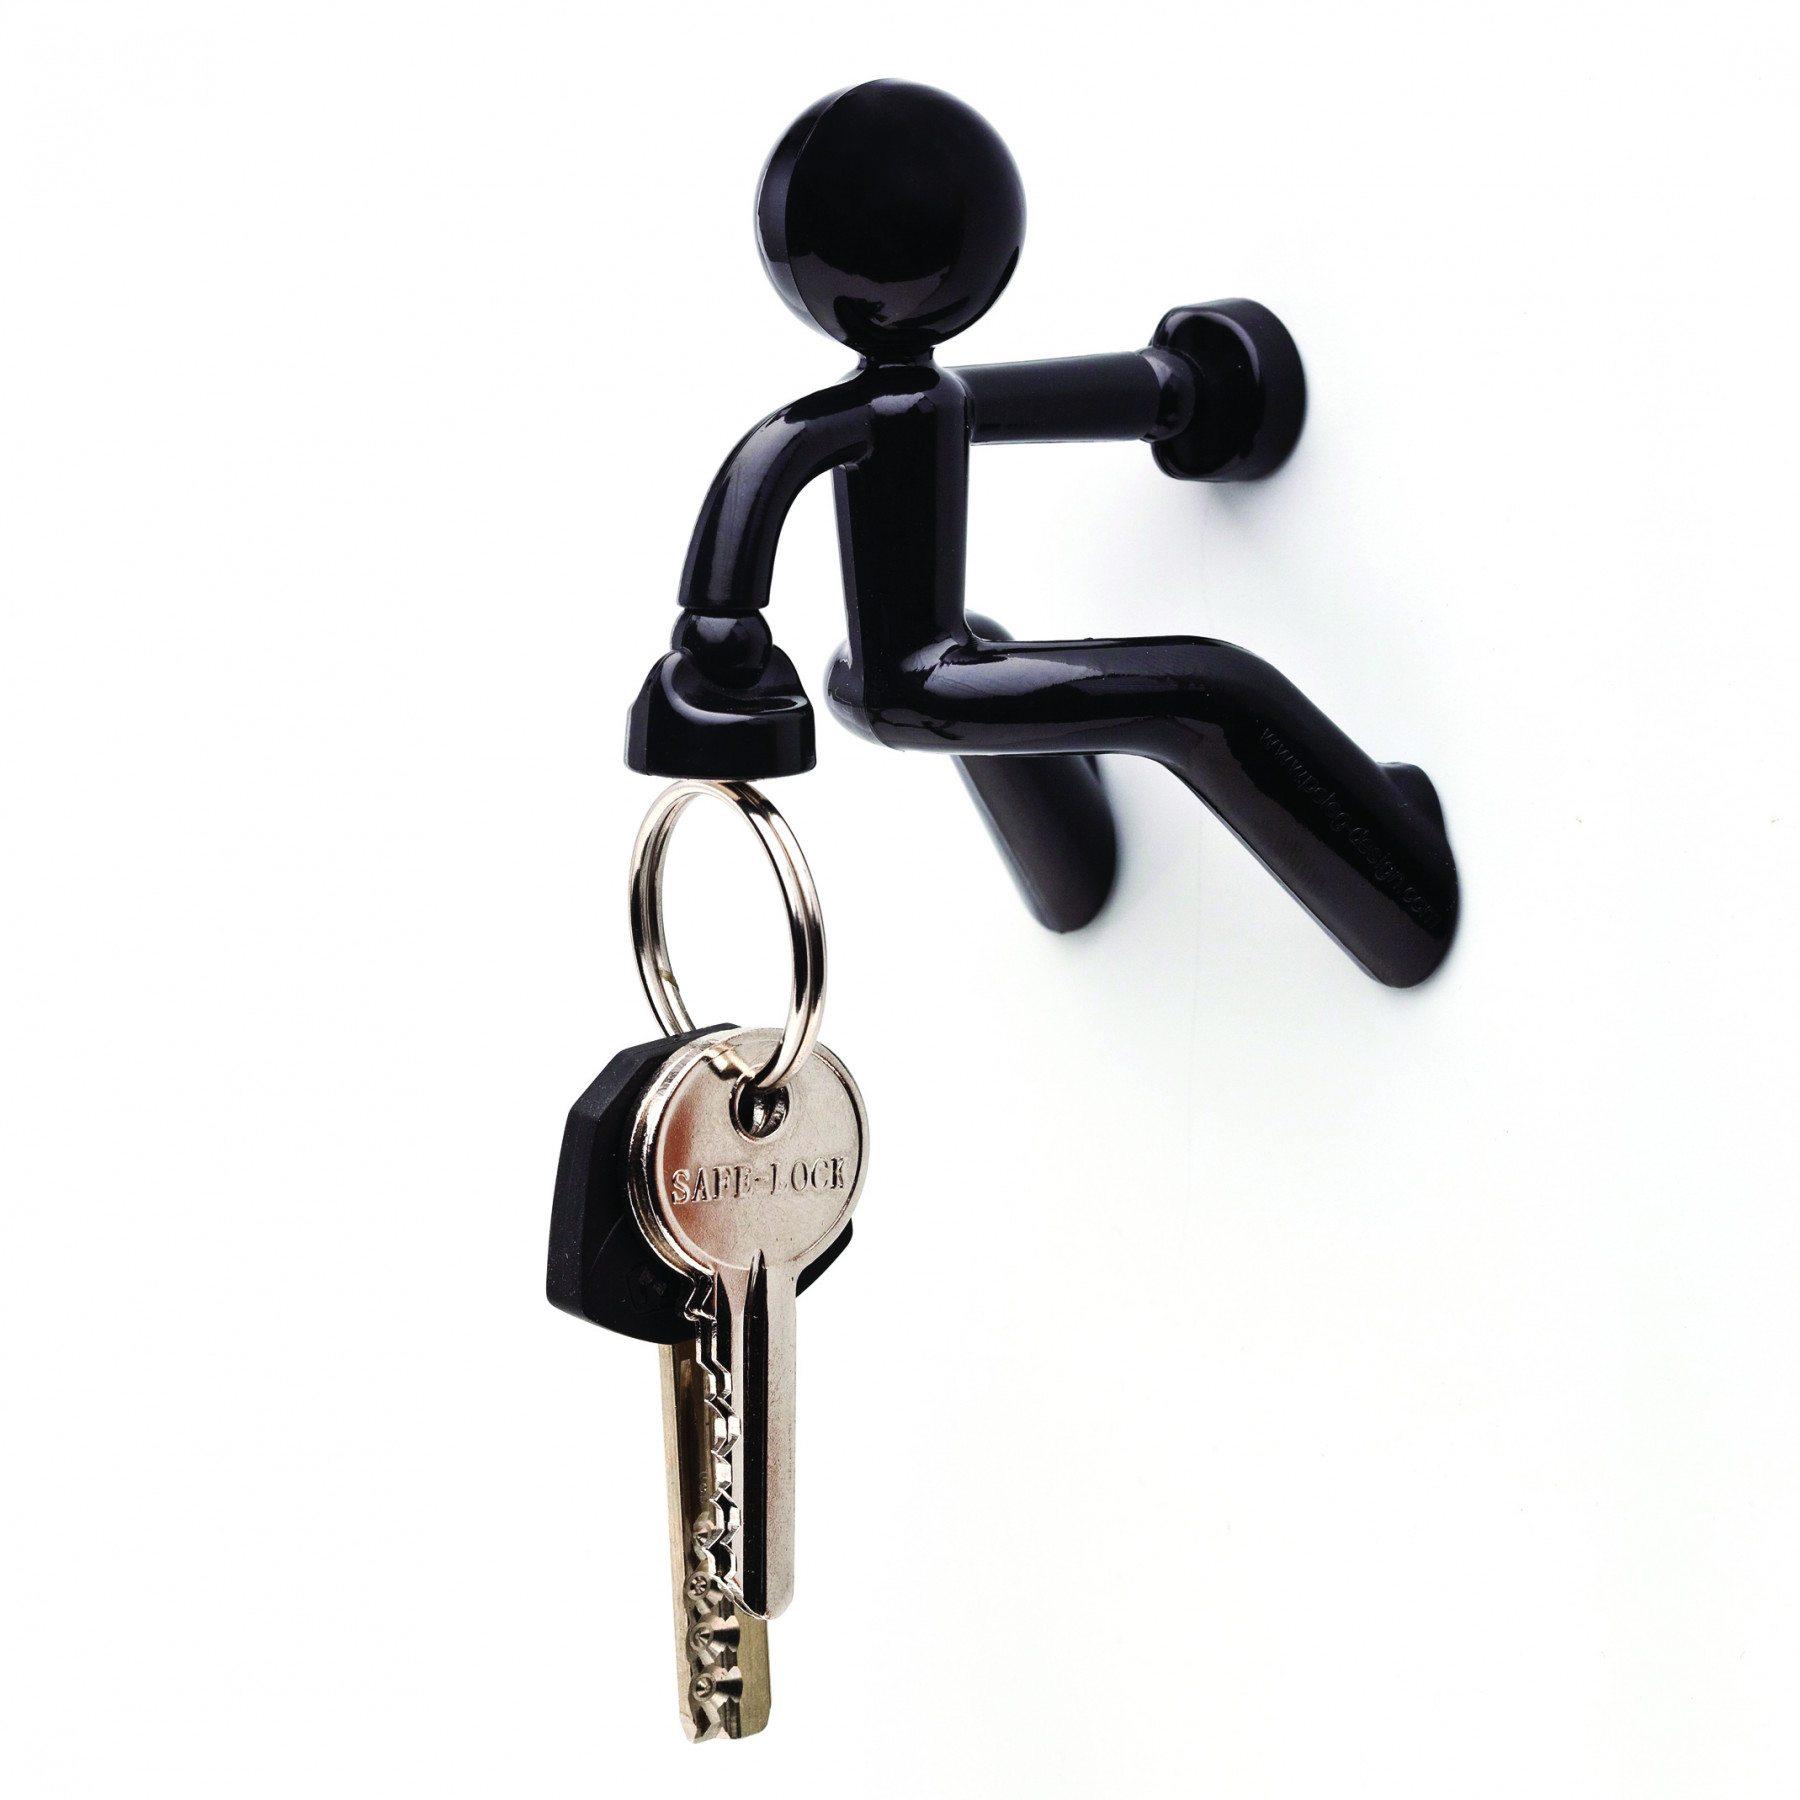 Magnetische sleutelhouder Pete